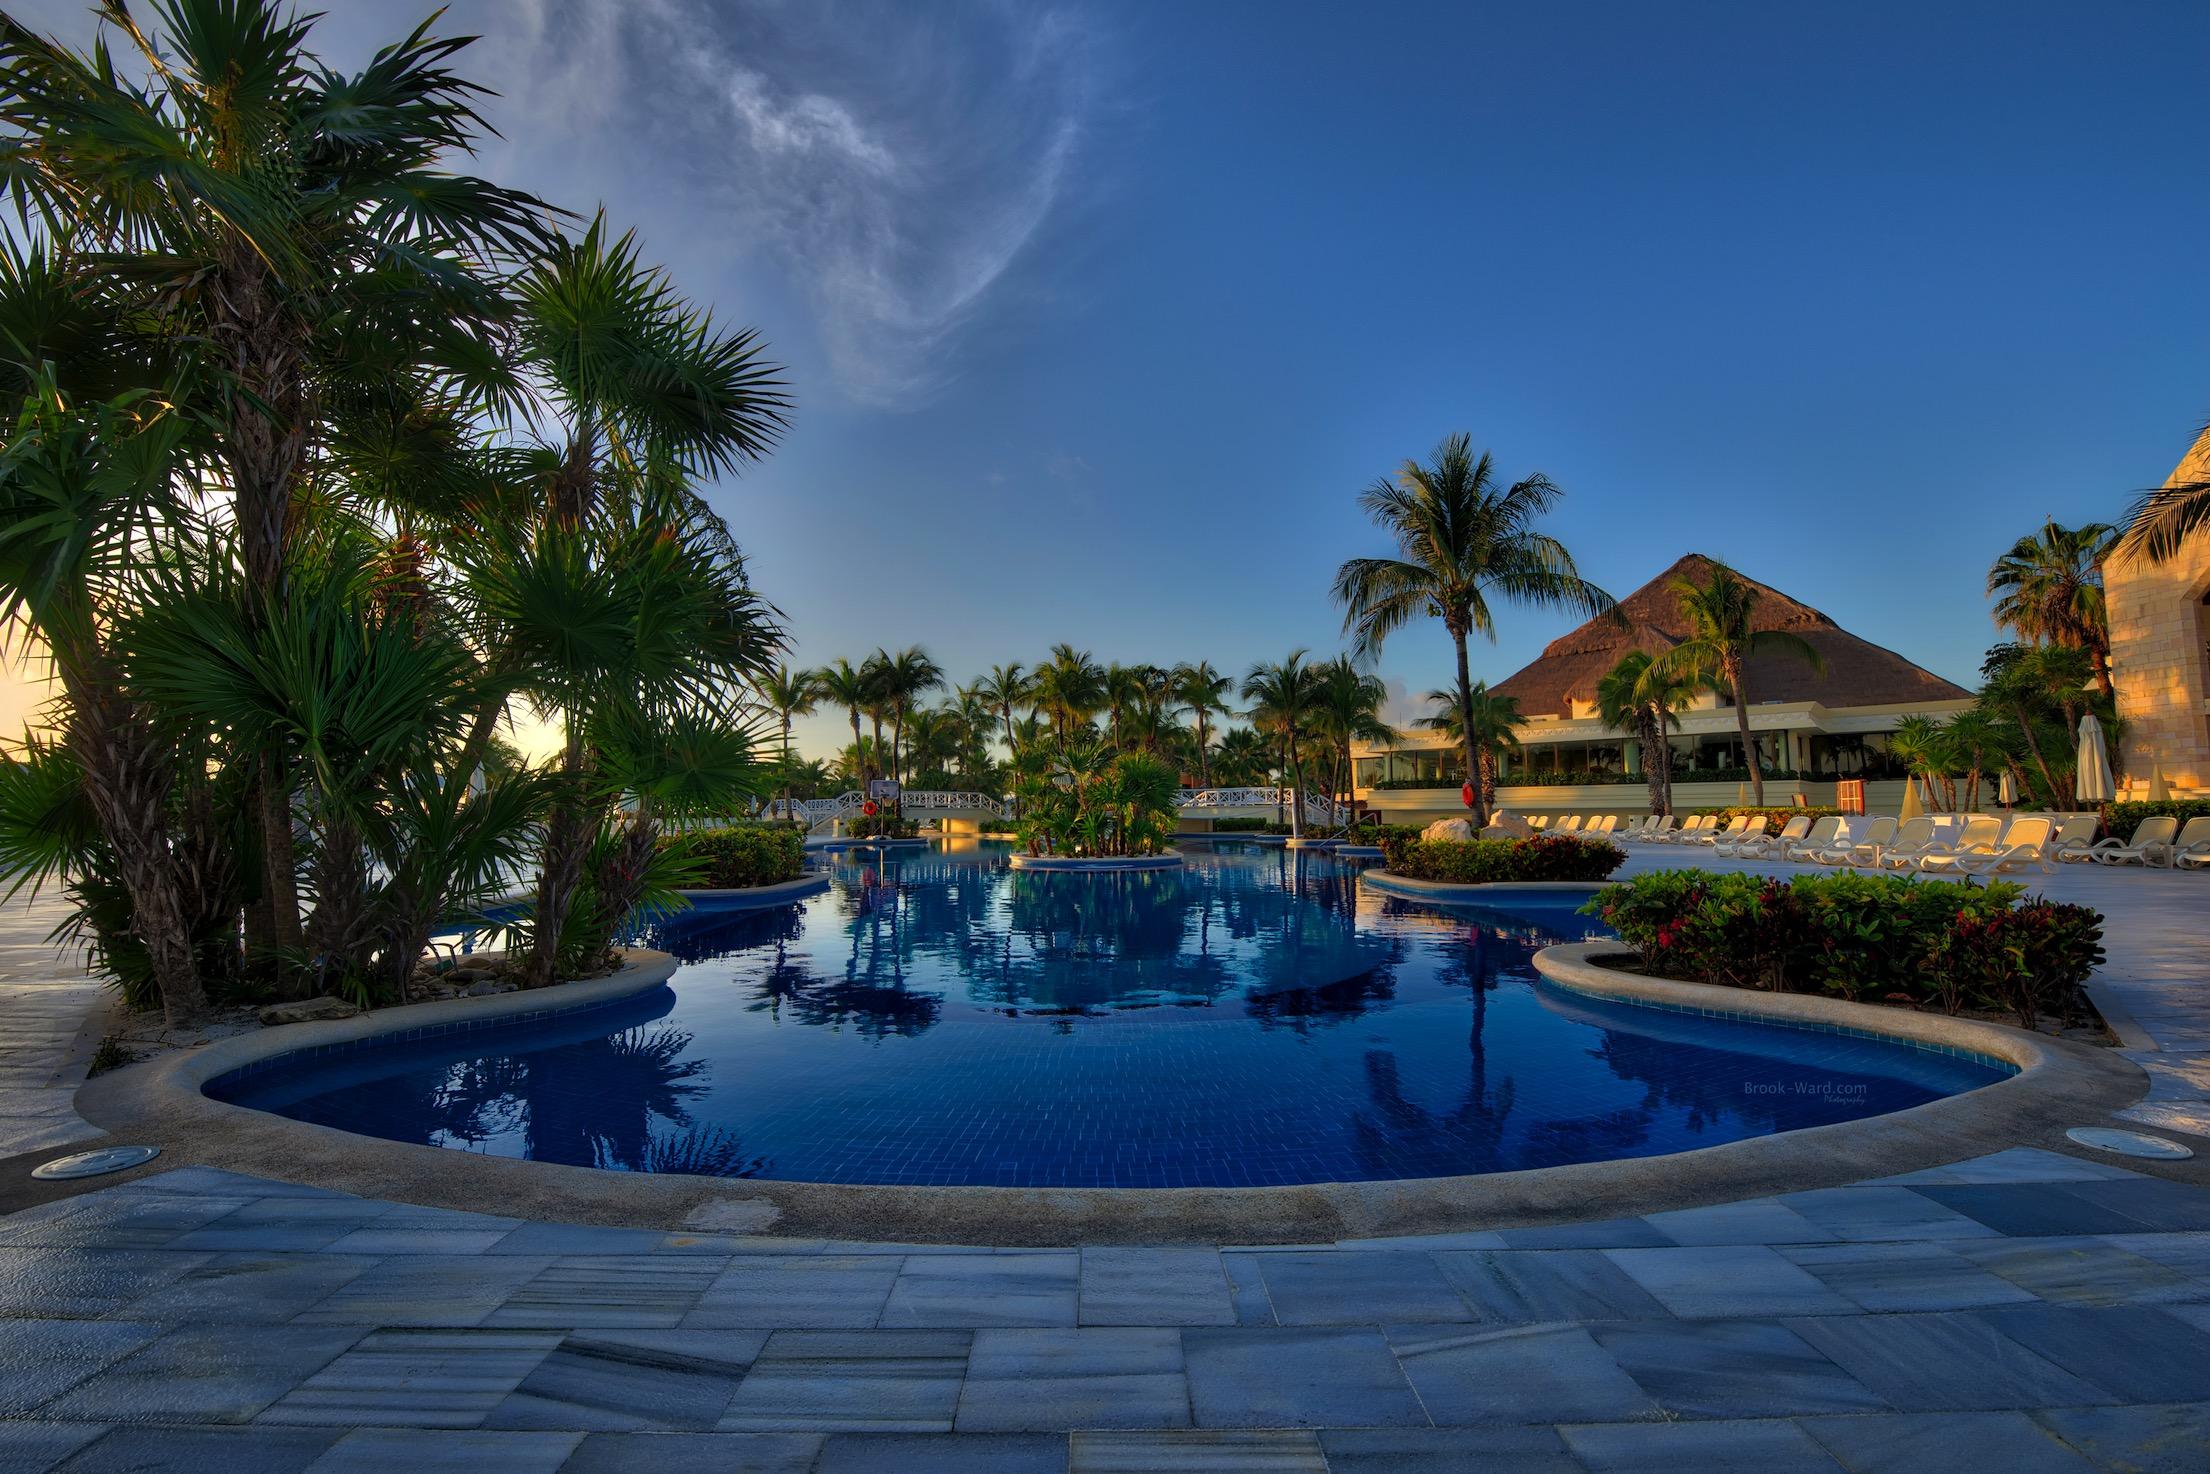 Mexican Resort Pool